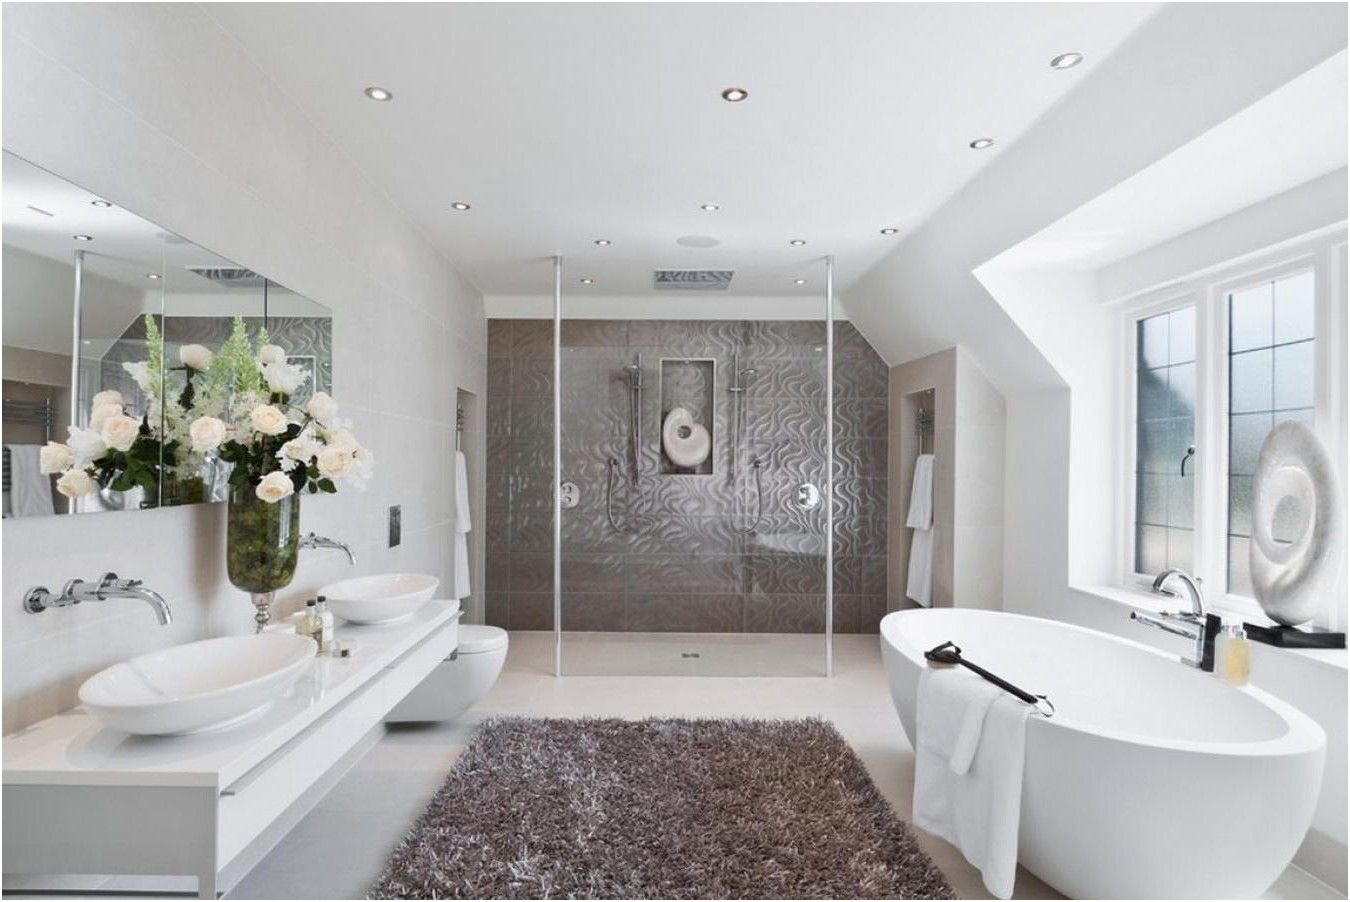 Grand Bathroom Designs Gurdjieffouspensky From Grand